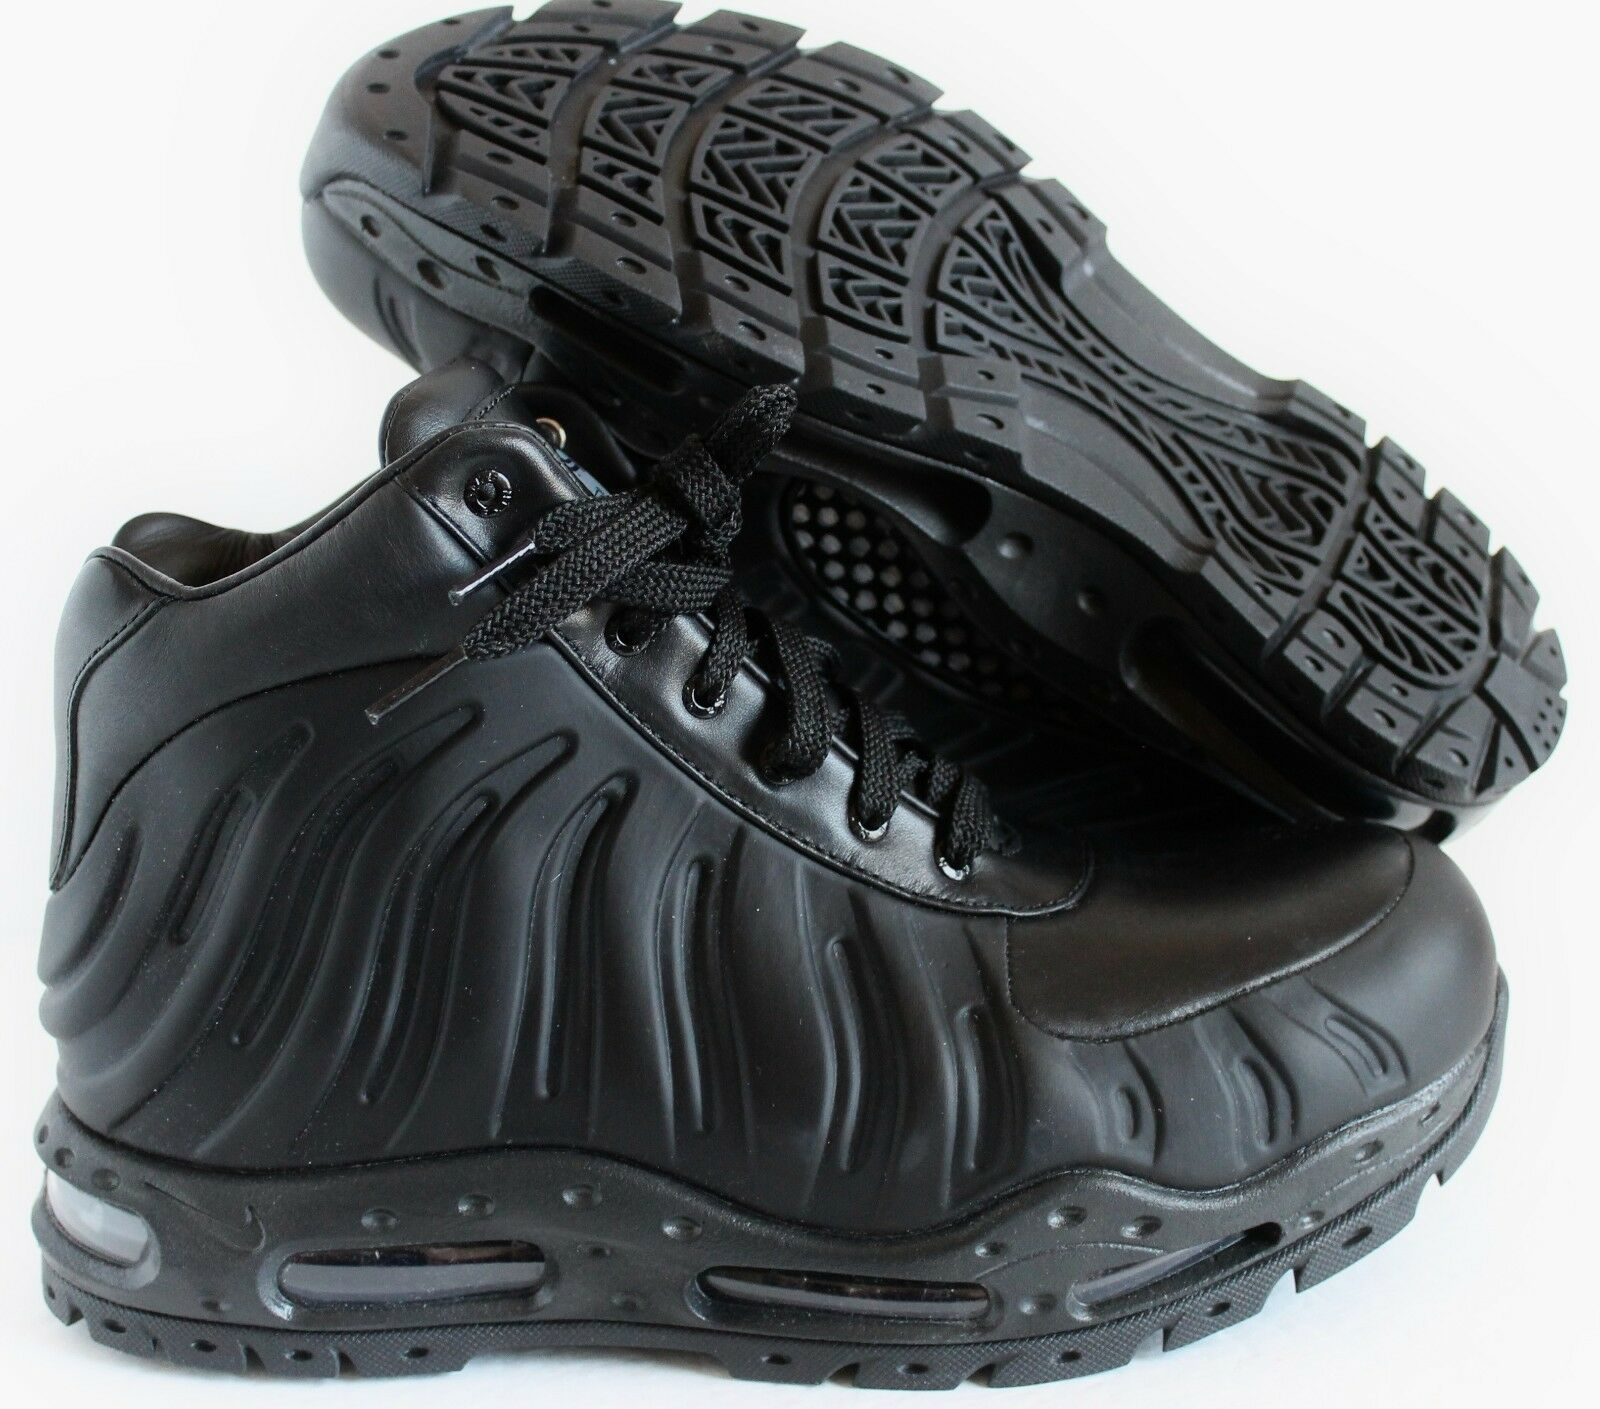 NIKE AIR MAX FOAMDOME FOAMPOSITE BOOTS BLACK-BLACK SZ 10.5 [843749-002]